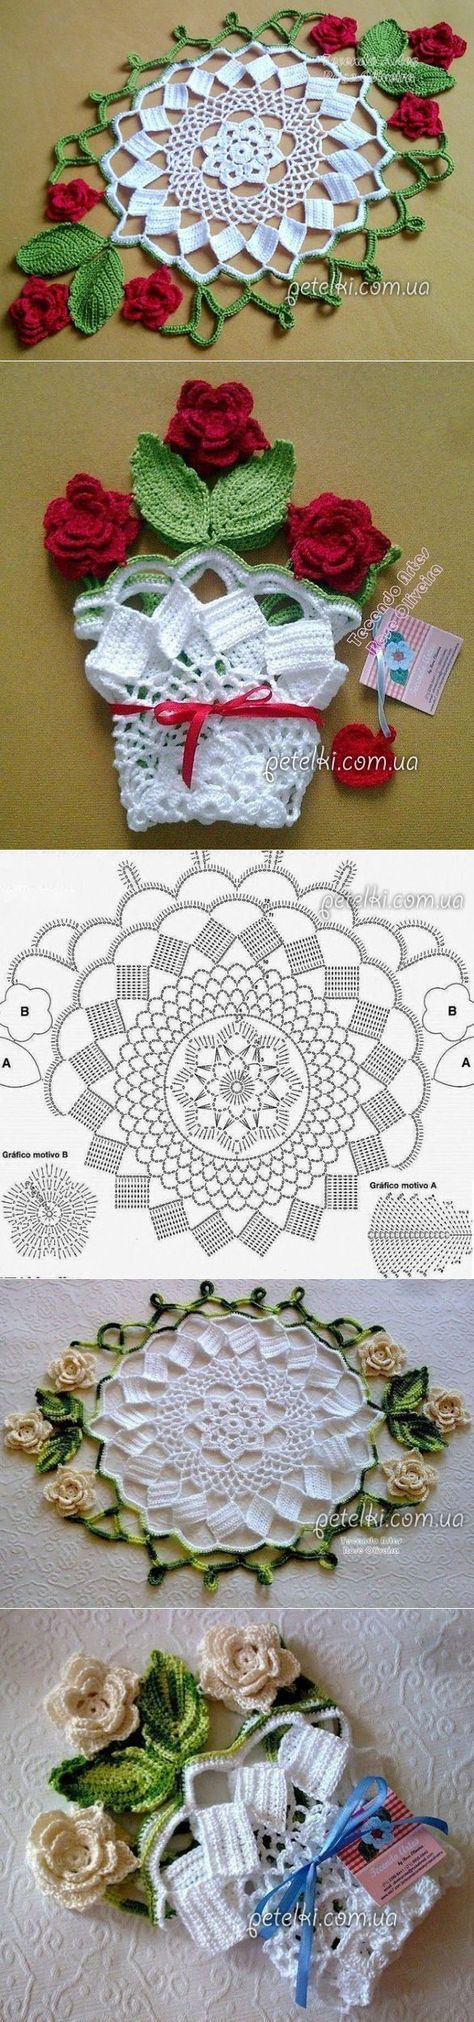 SANDRA CROCHE: Conjunto de Toalhas de Croche | Crochet | Pinterest ...